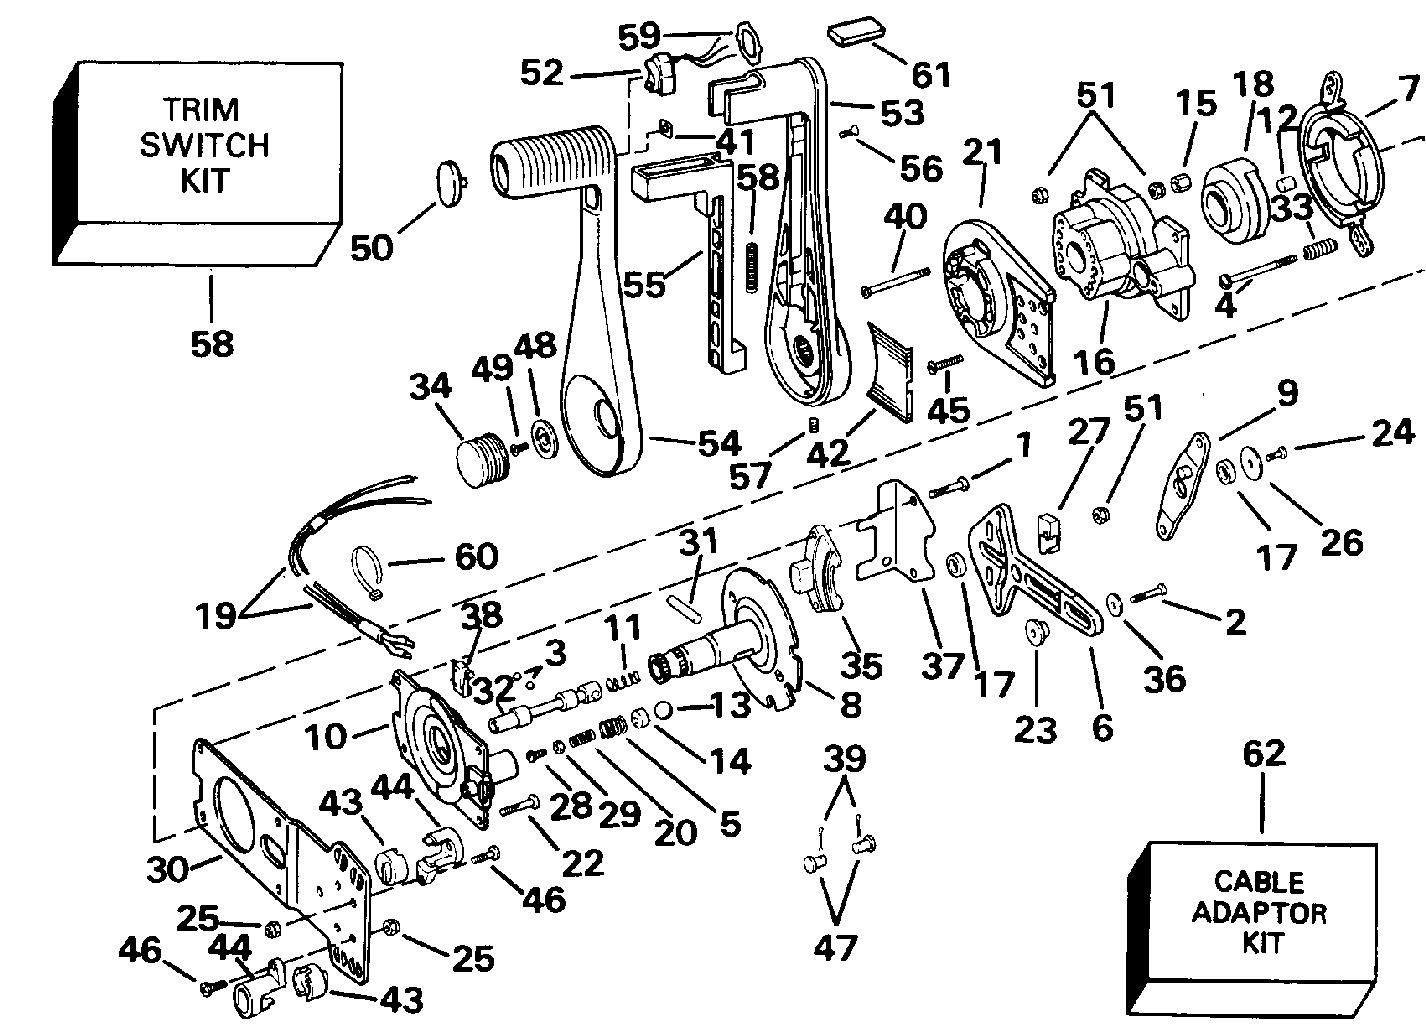 hight resolution of omc shifter diagram just wiring diagram omc shifter parts omc shifter diagram